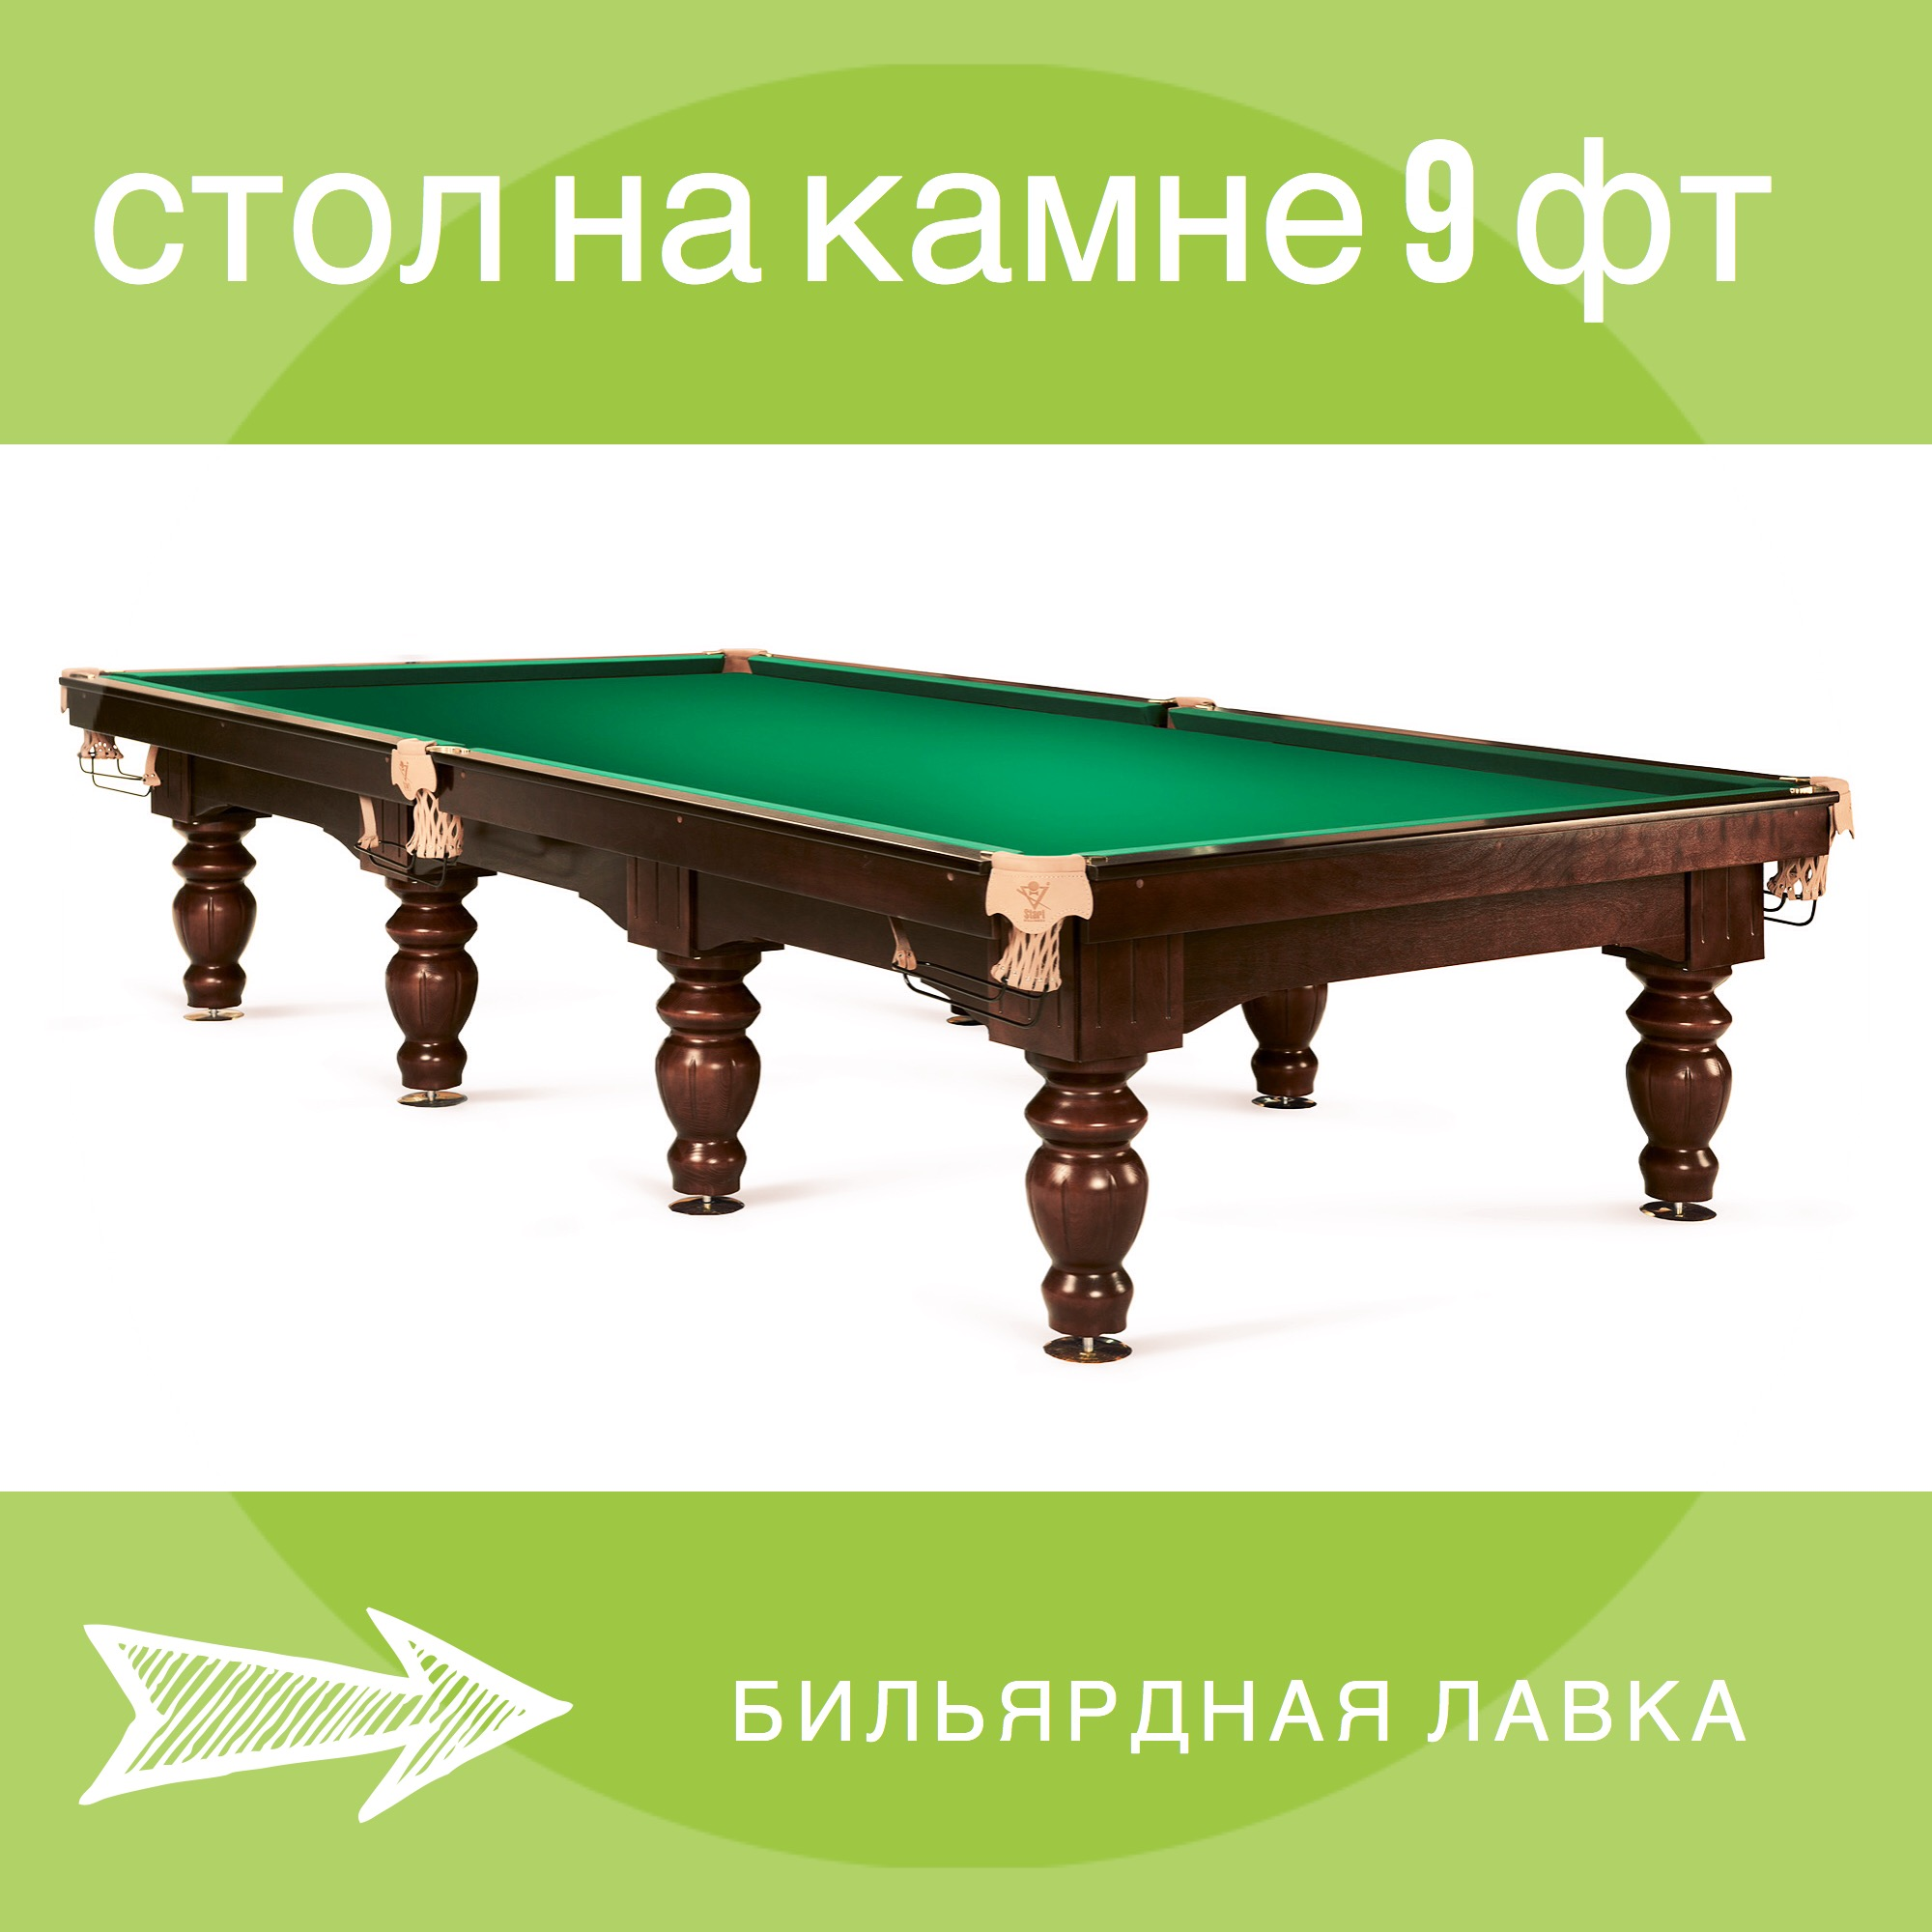 Бильярдный стол 9 фт (Фабрика Старт)